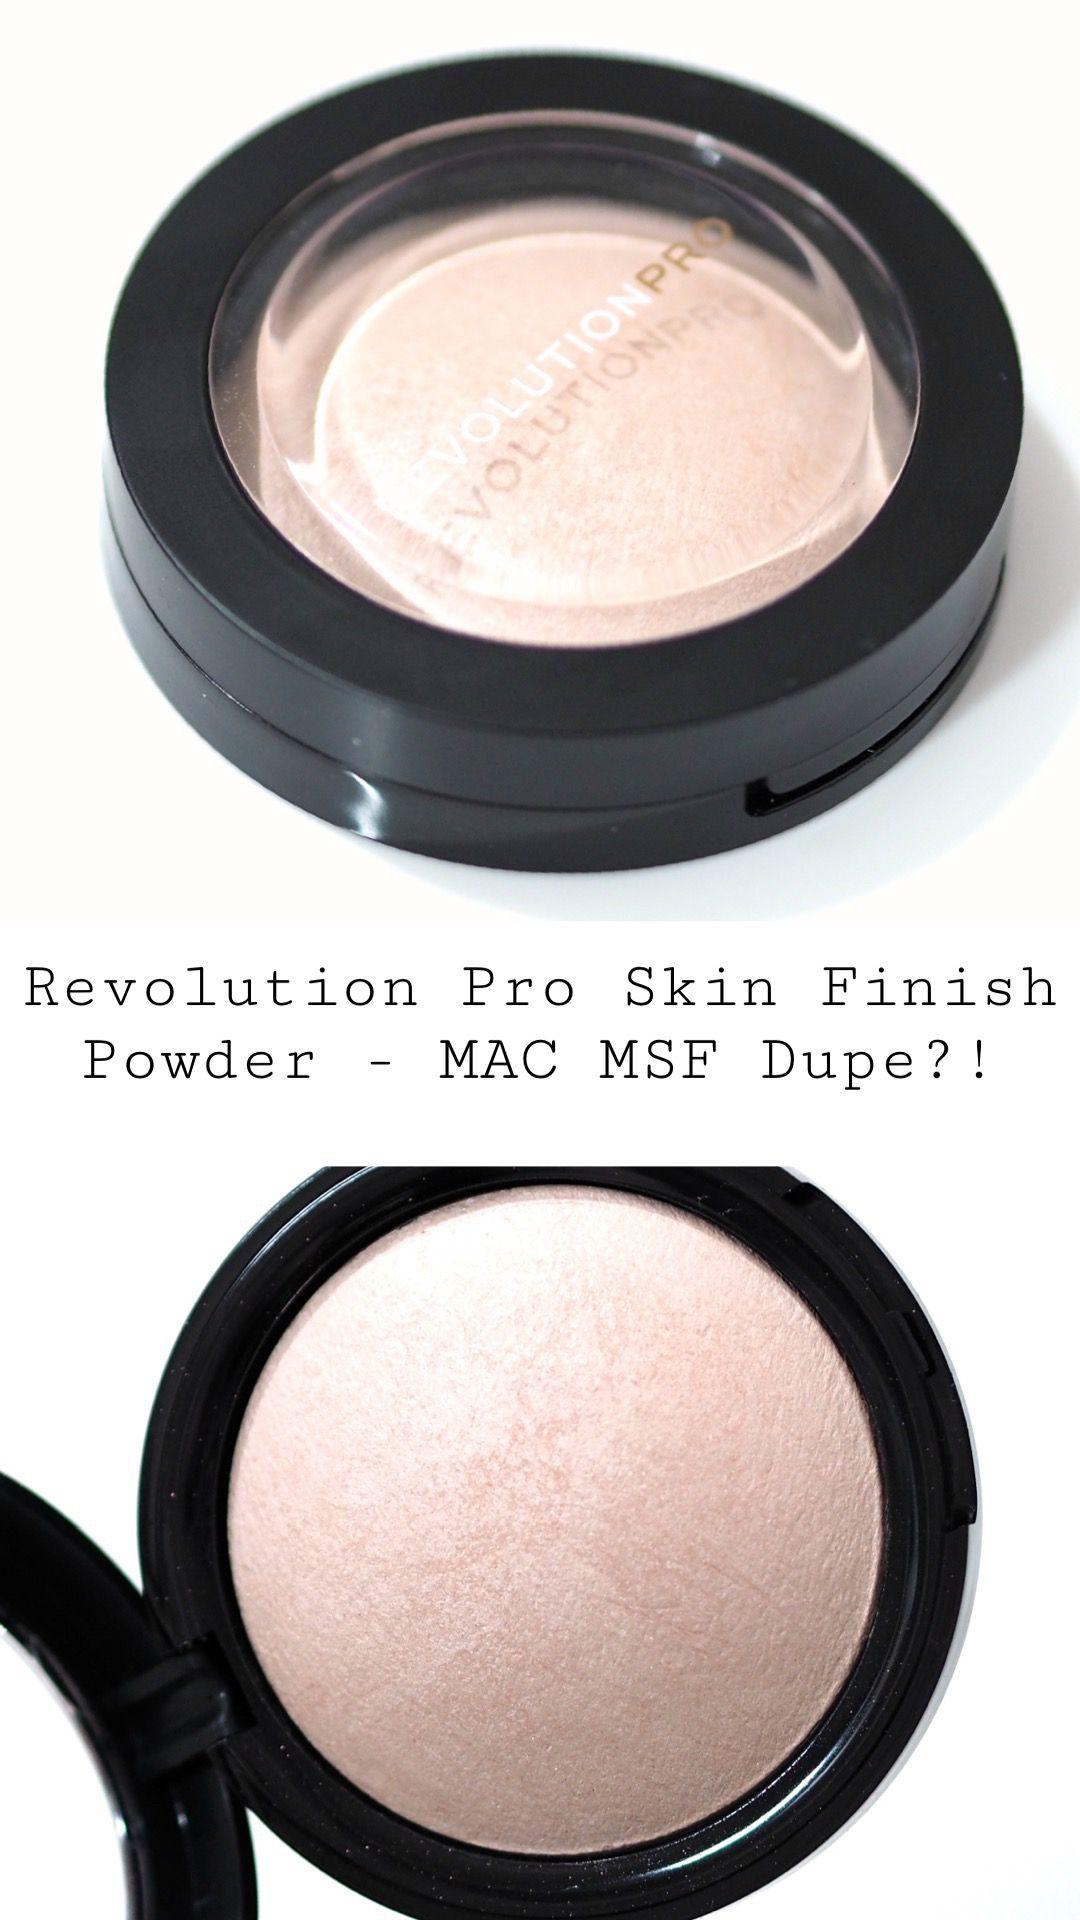 Revolution Pro Luminescence Skin Finish Powder Review